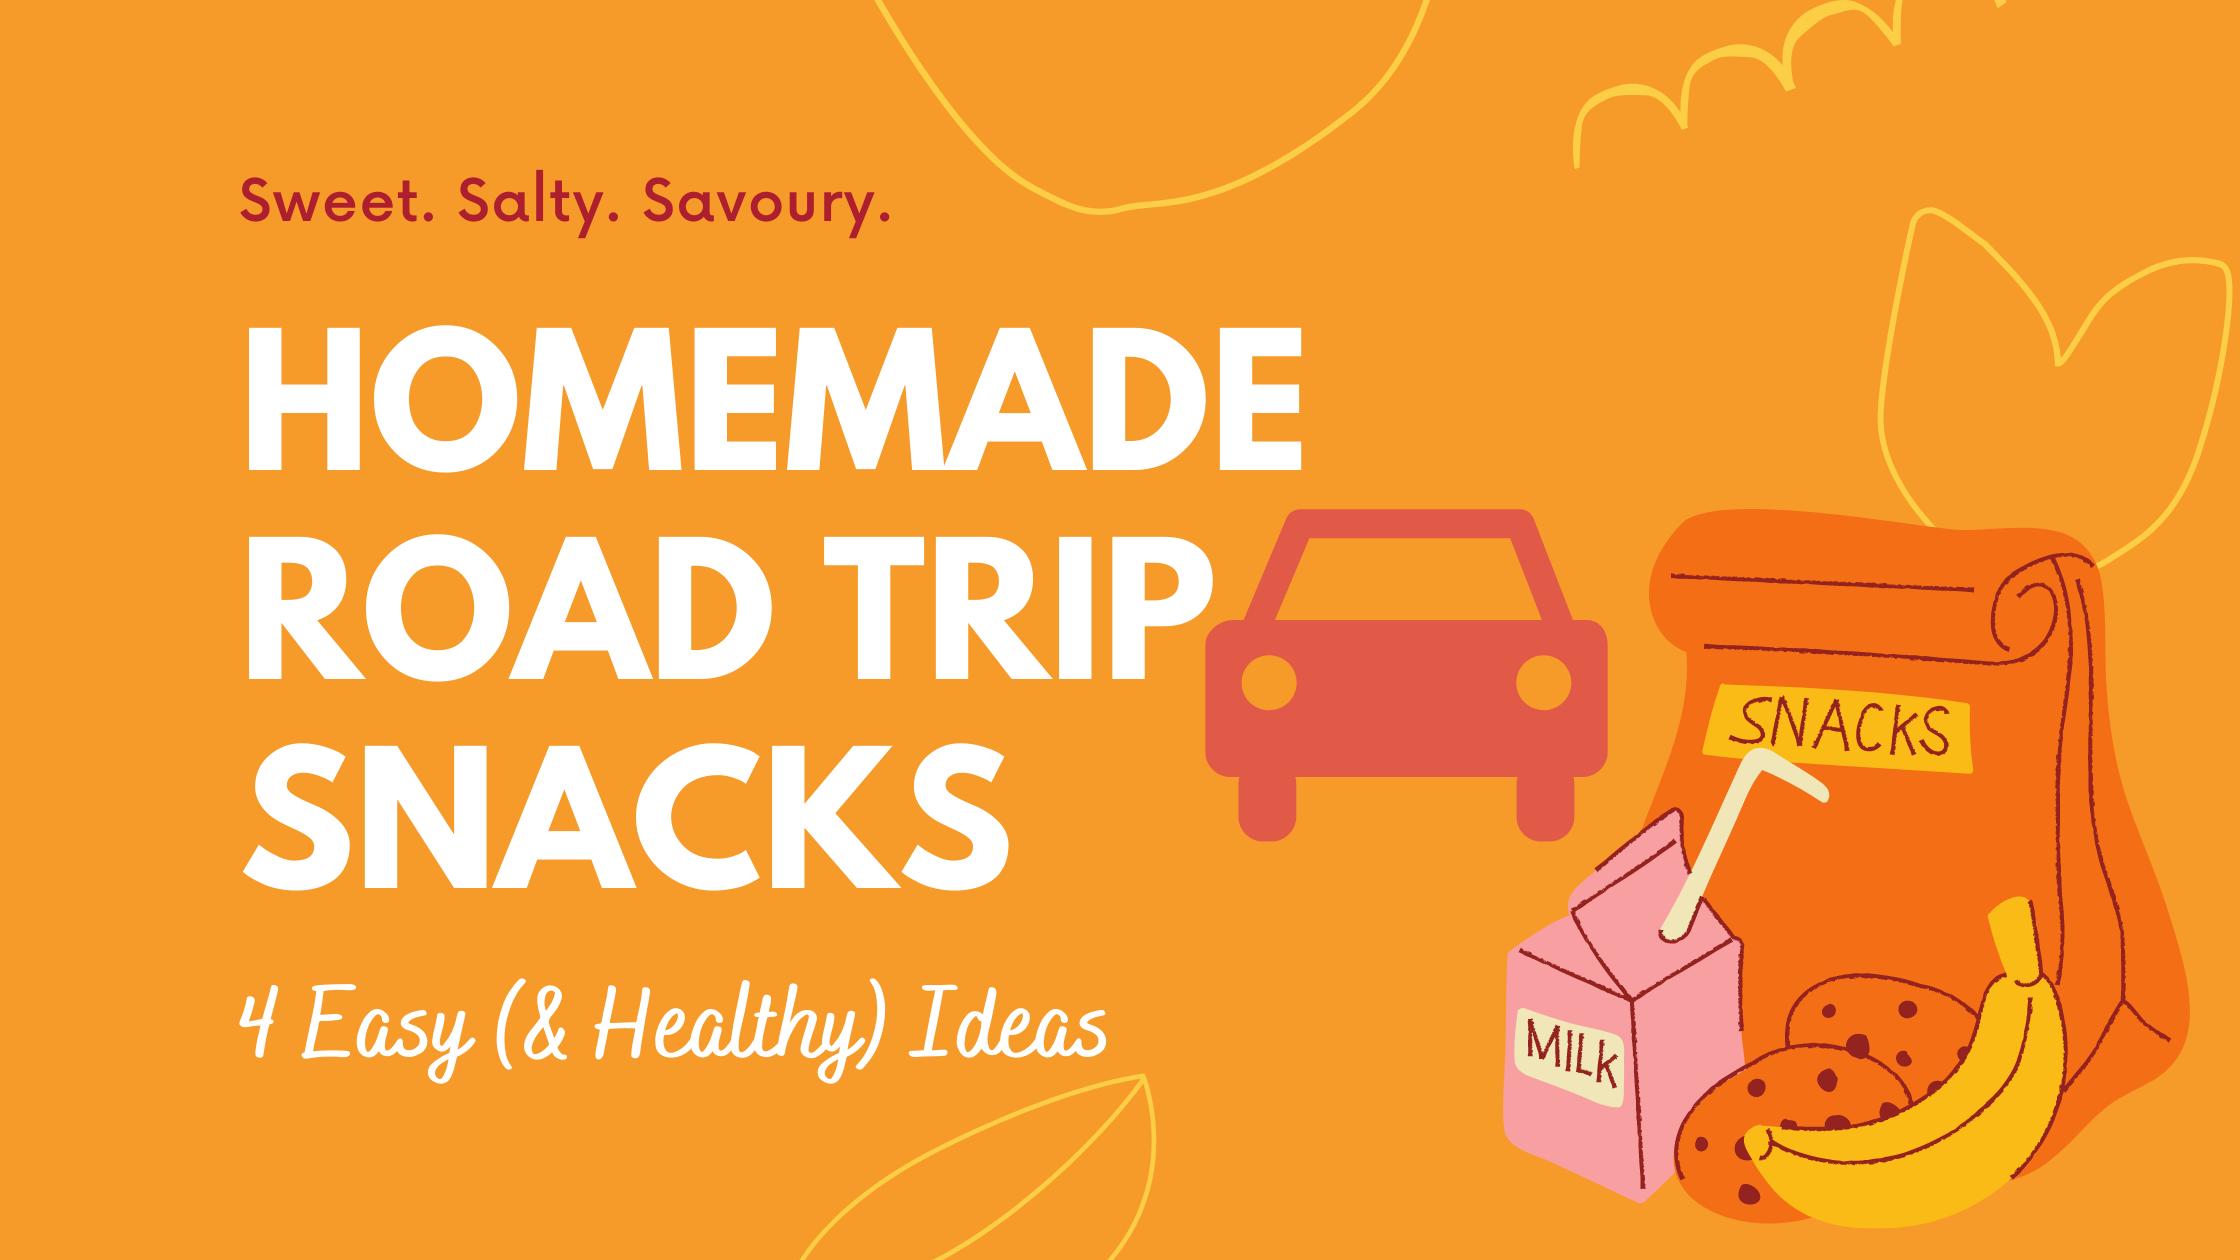 Homemade Road Trip Snacks